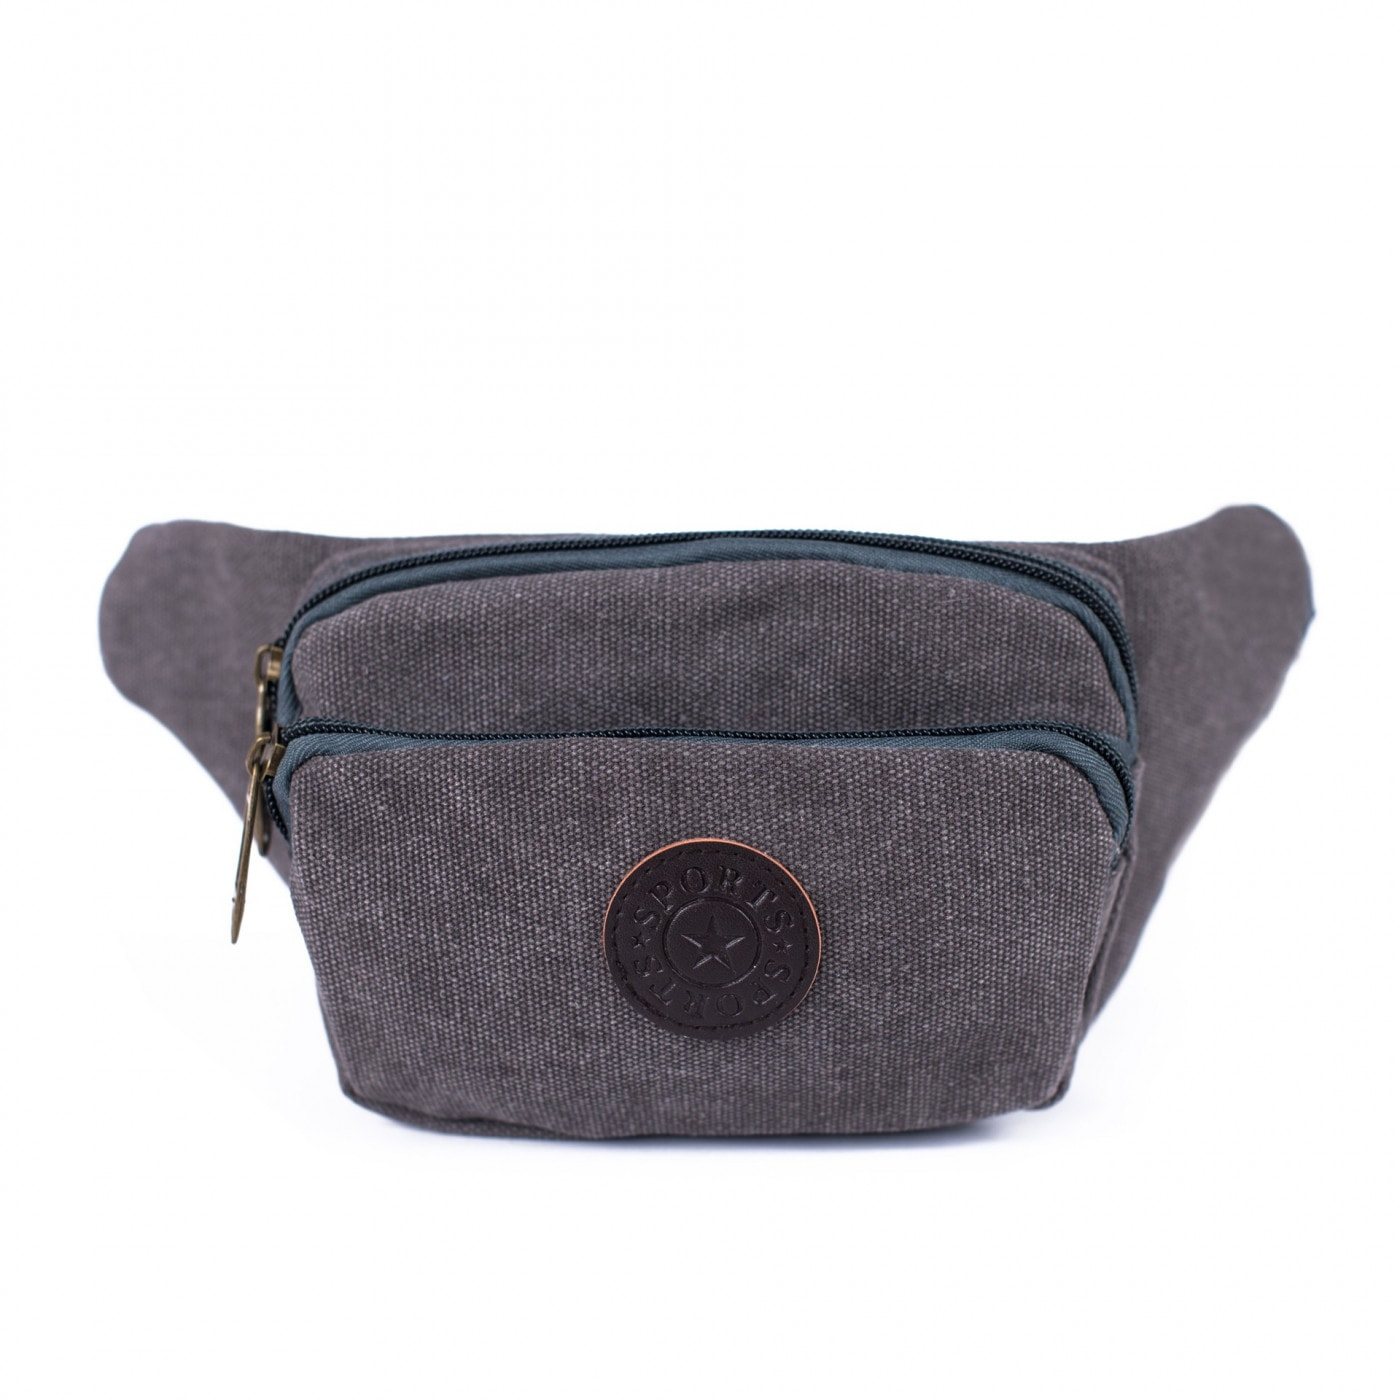 Art Of Polo Unisex's Bag tr16553